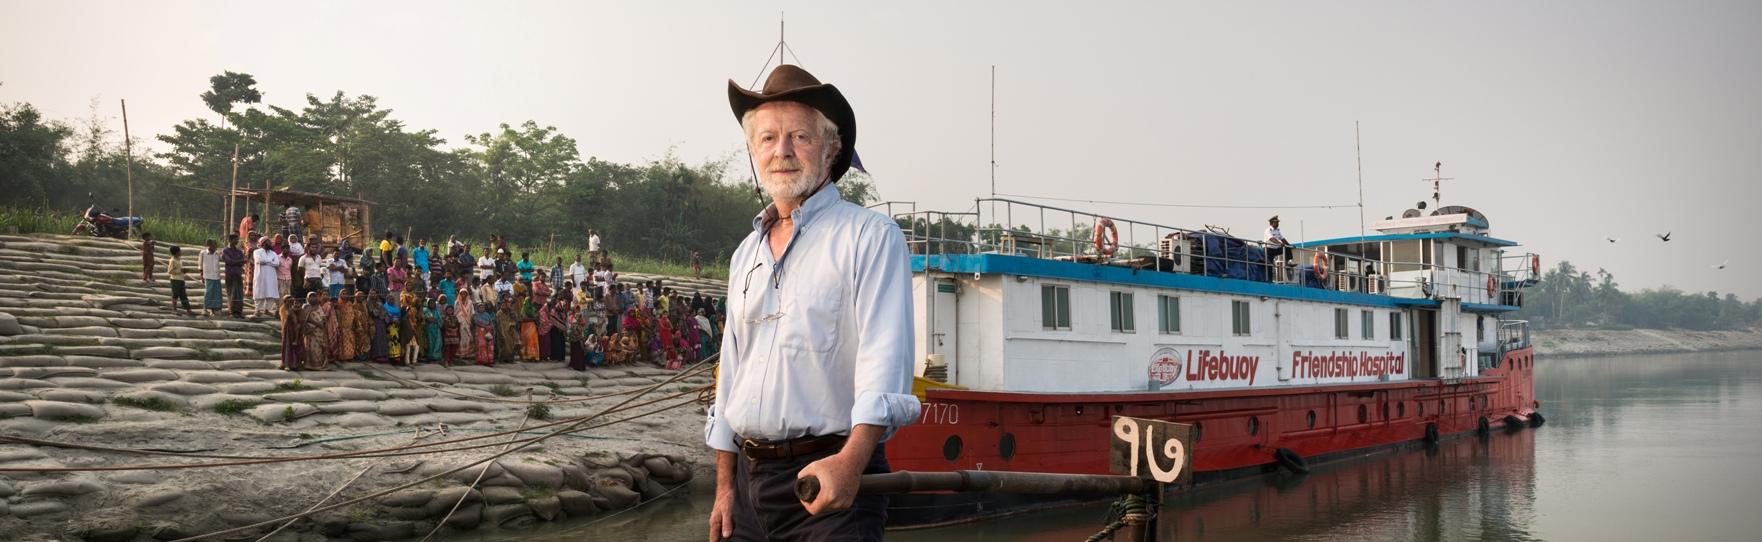 mer,litétrature,livre,prix,eric tabarly,prix eric tabarly,navigateur solidaire,bangladesh,péniche,récit